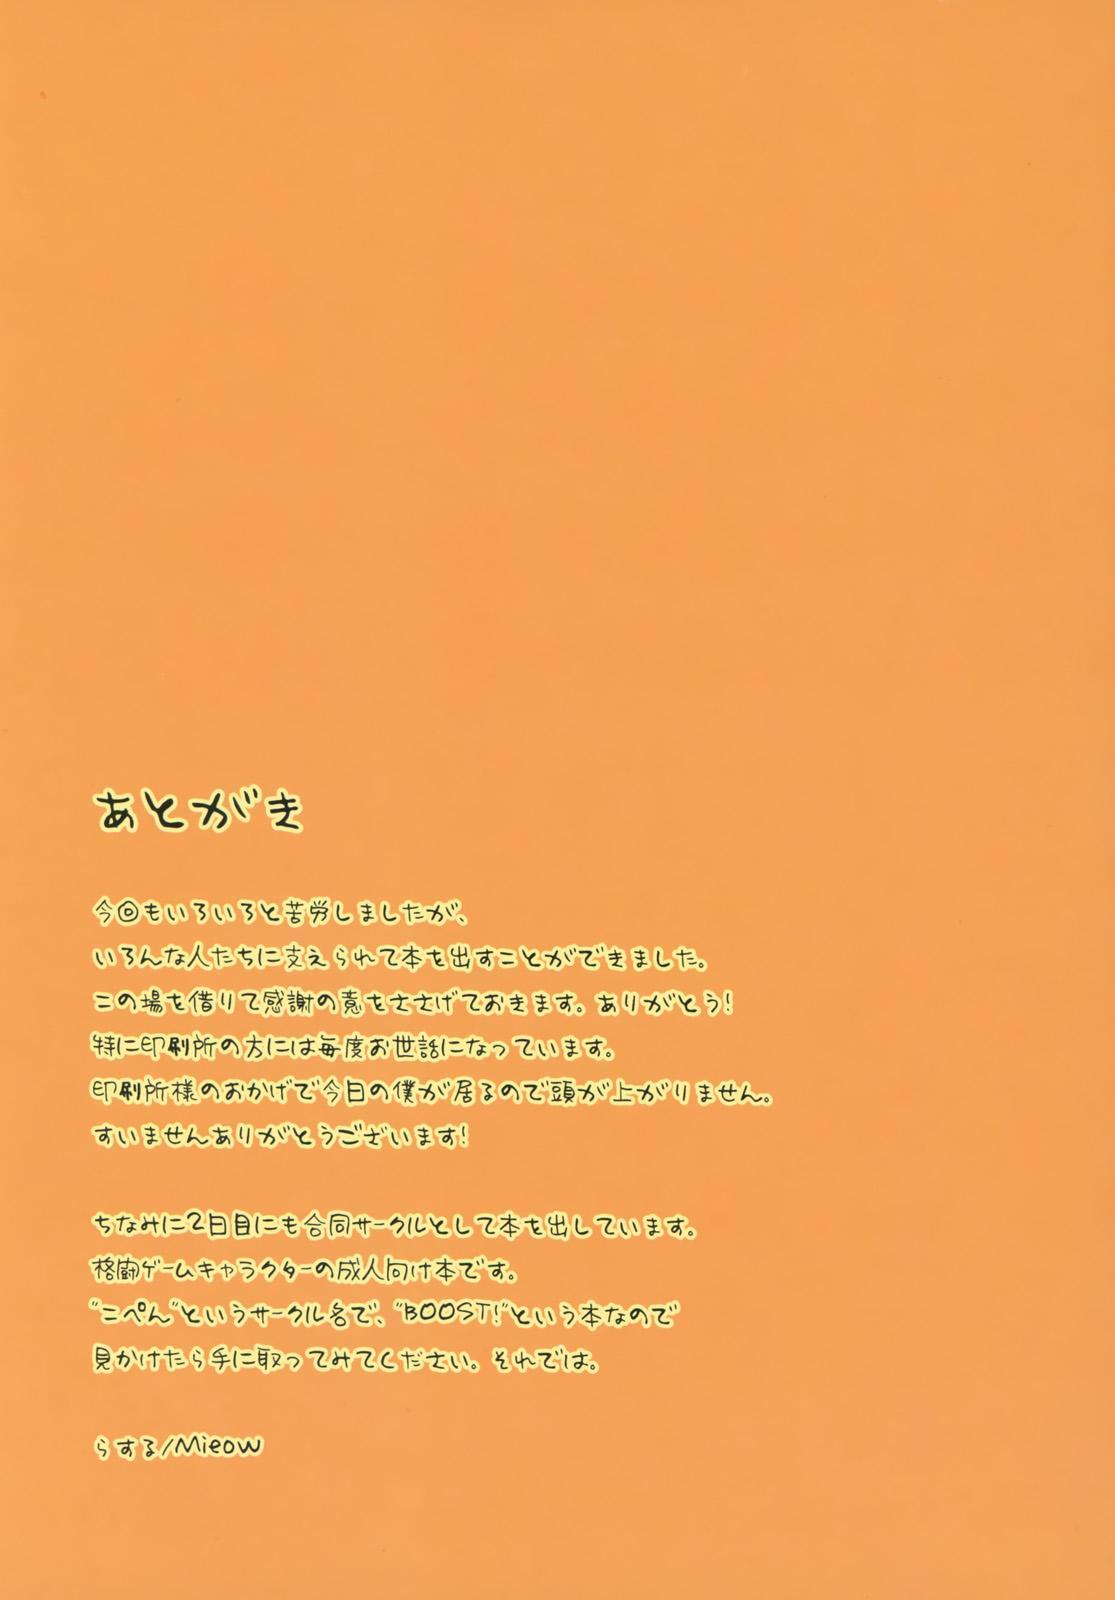 Lolicon Special 3 23